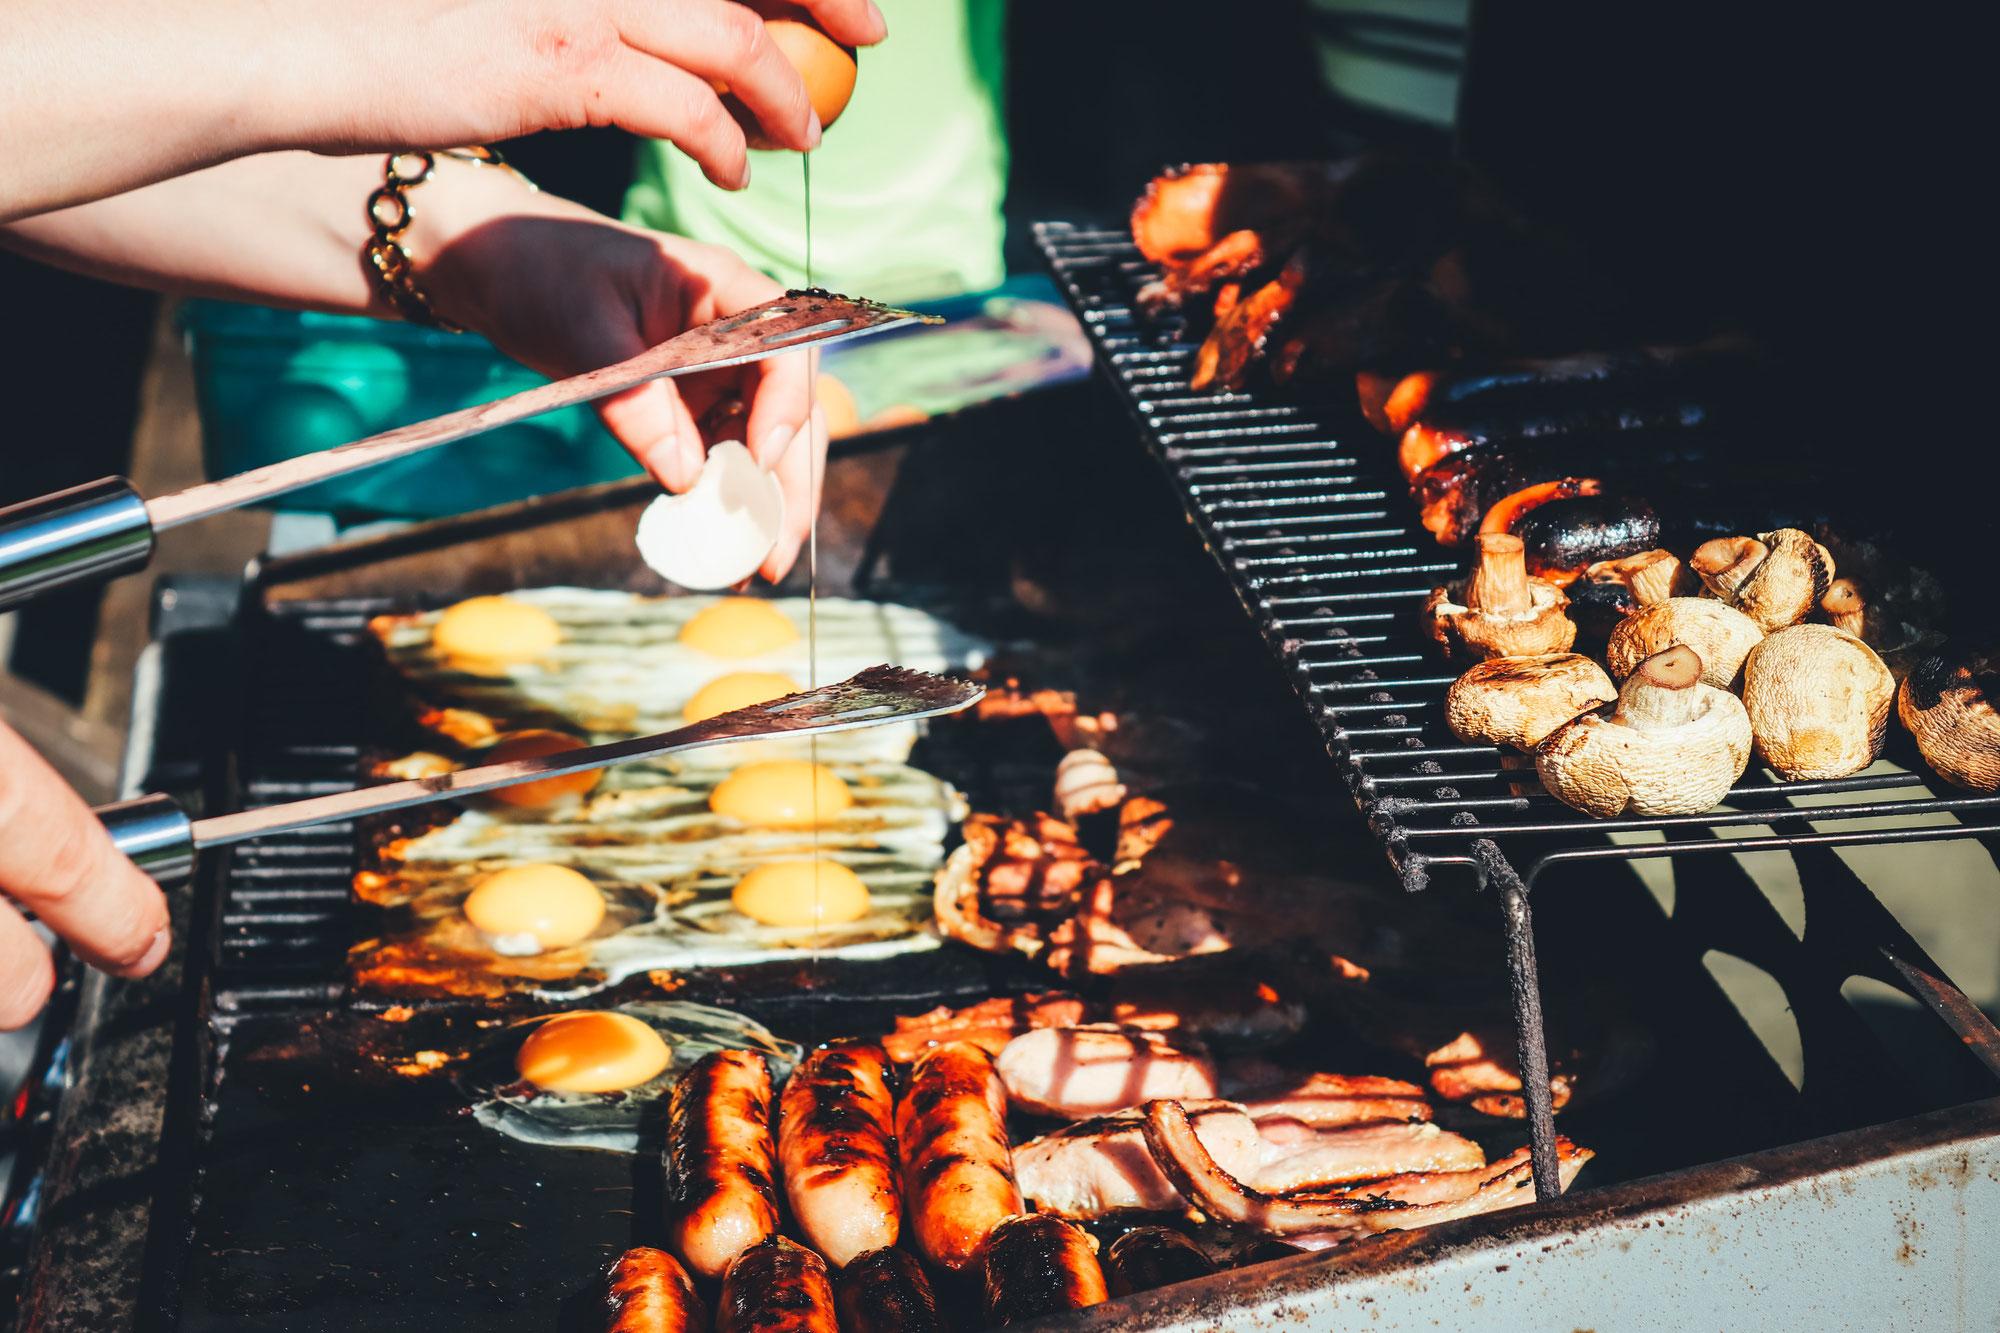 It's barbecue time! Low Carb Grillen & kohlenhydratarme Beilagen für den perfekten Grillabend